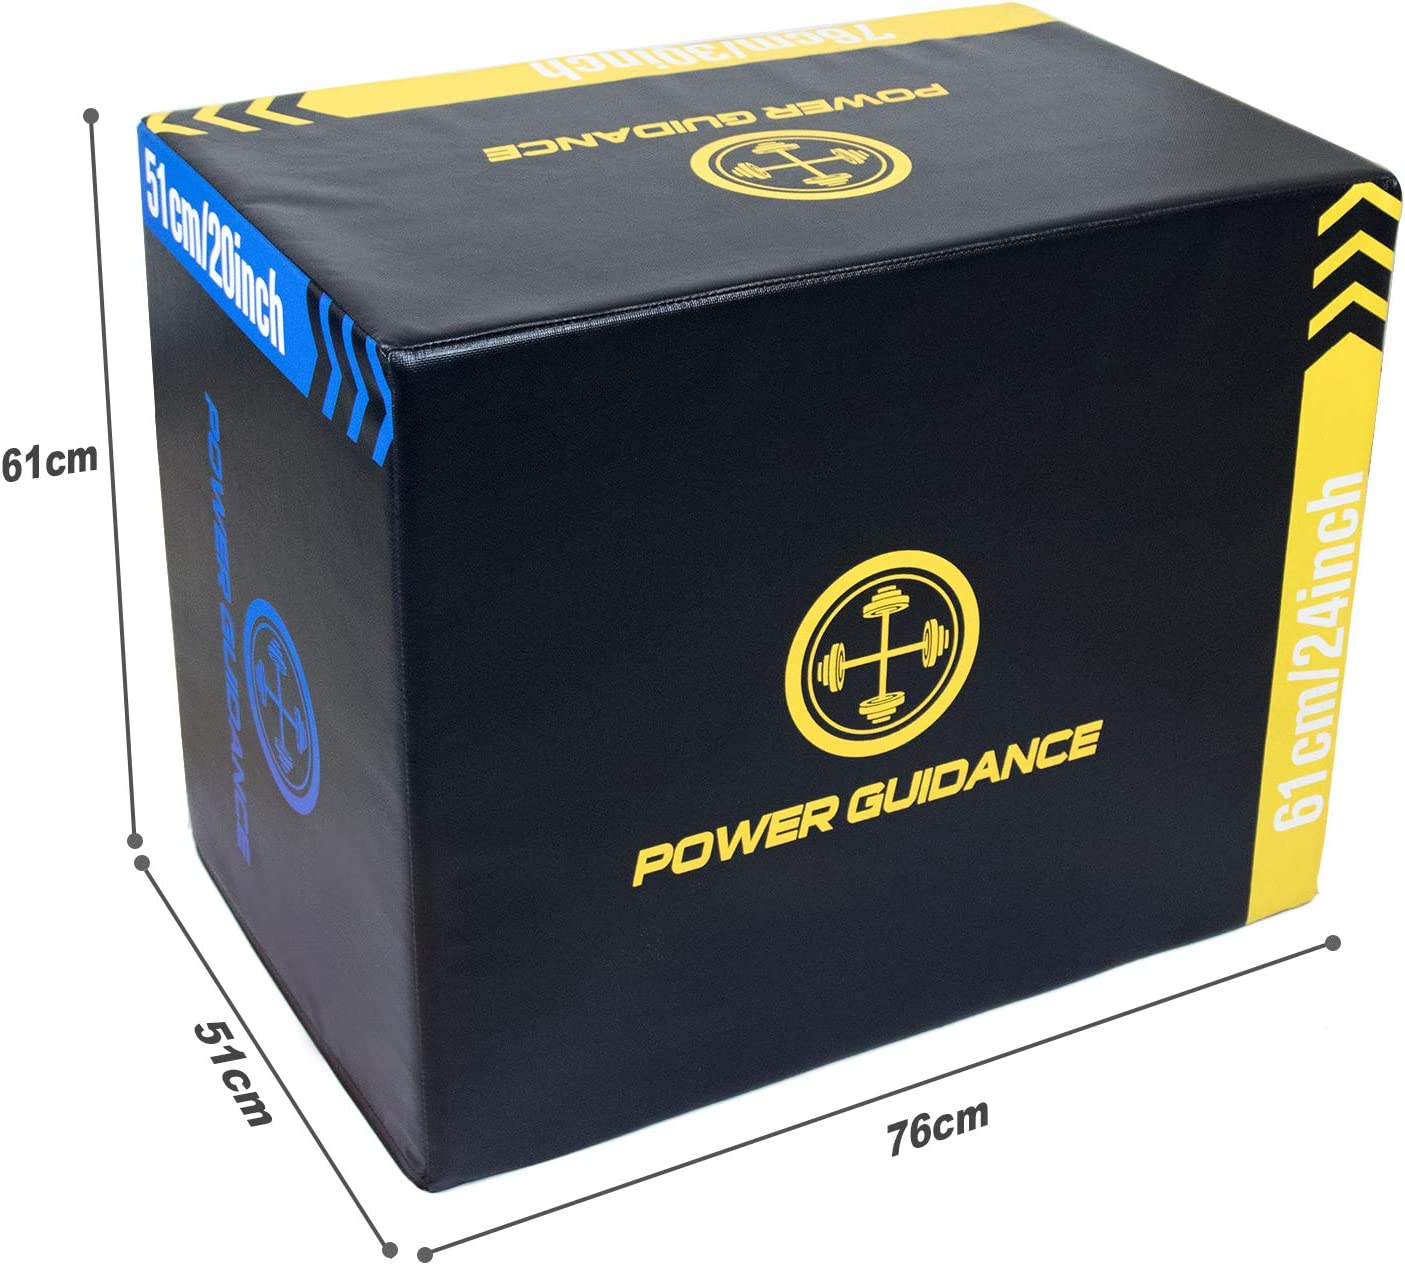 POWERGUIDANCE 3 en 1 Soft plyo Boxes 76 * 61 * 51cm Foam ...